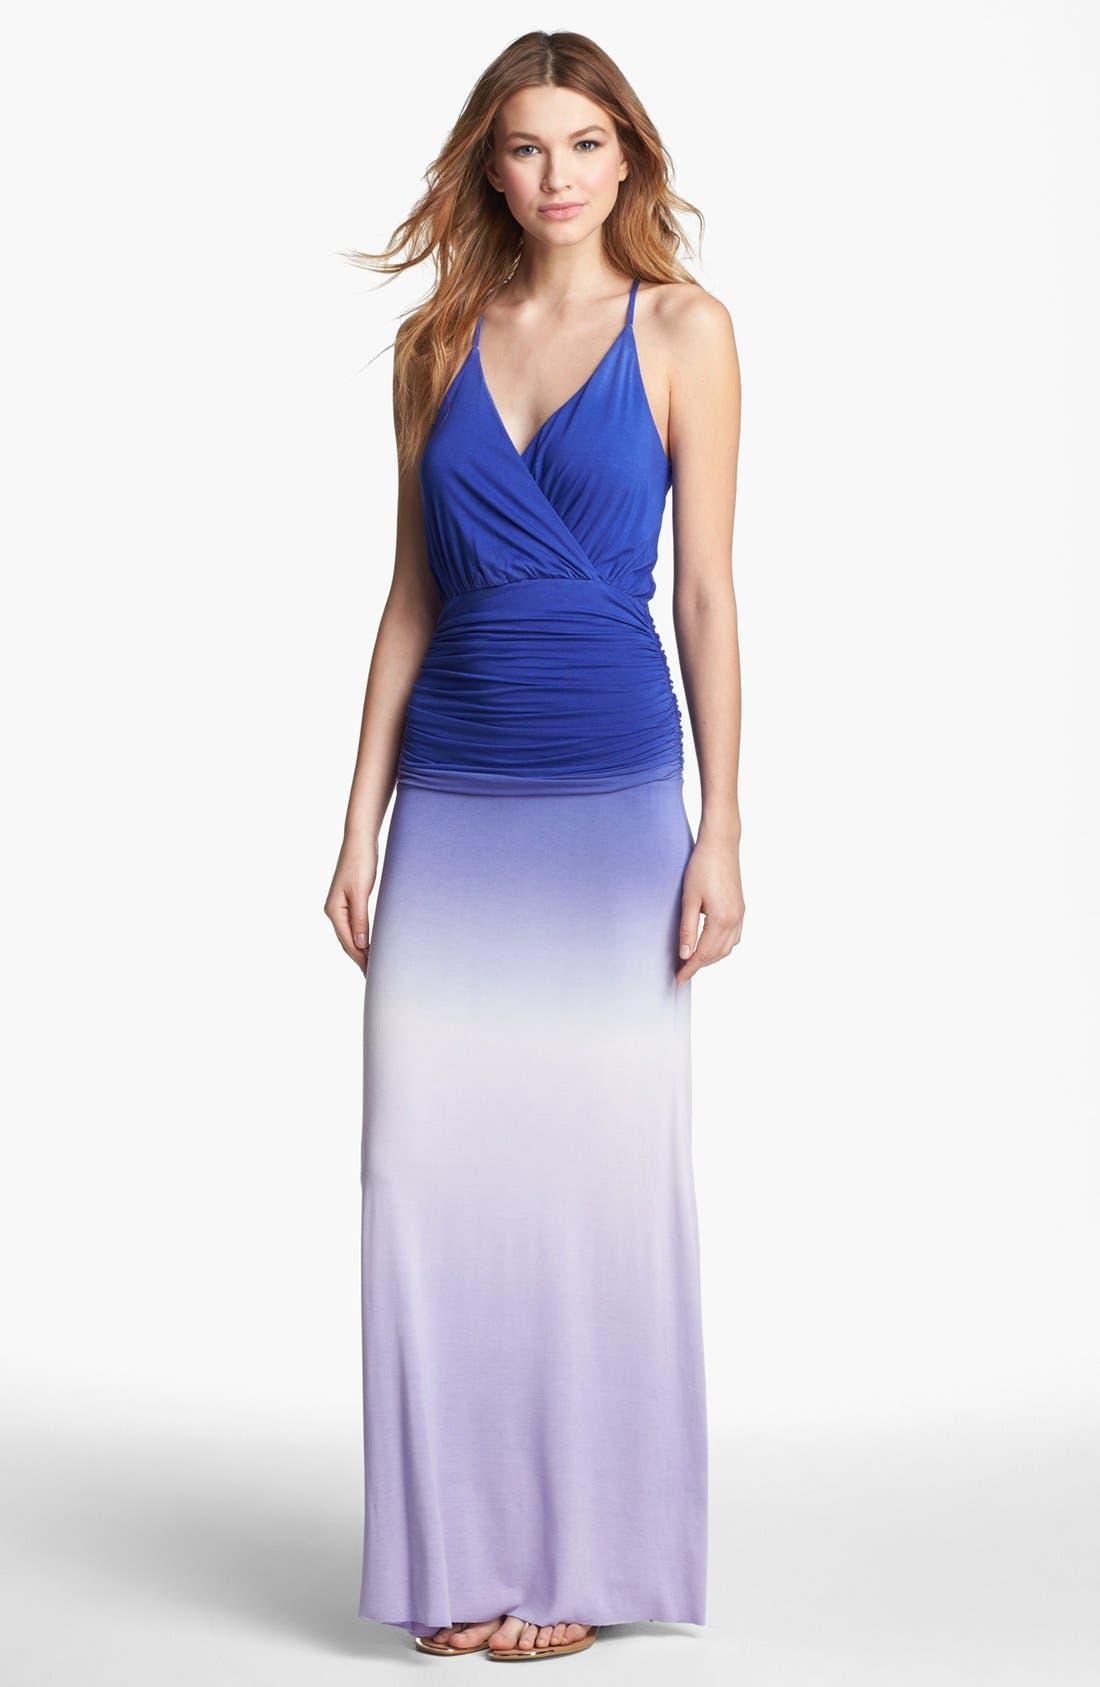 Alternate Image 1 Selected - Young, Fabulous & Broke 'Hattie' Maxi Dress